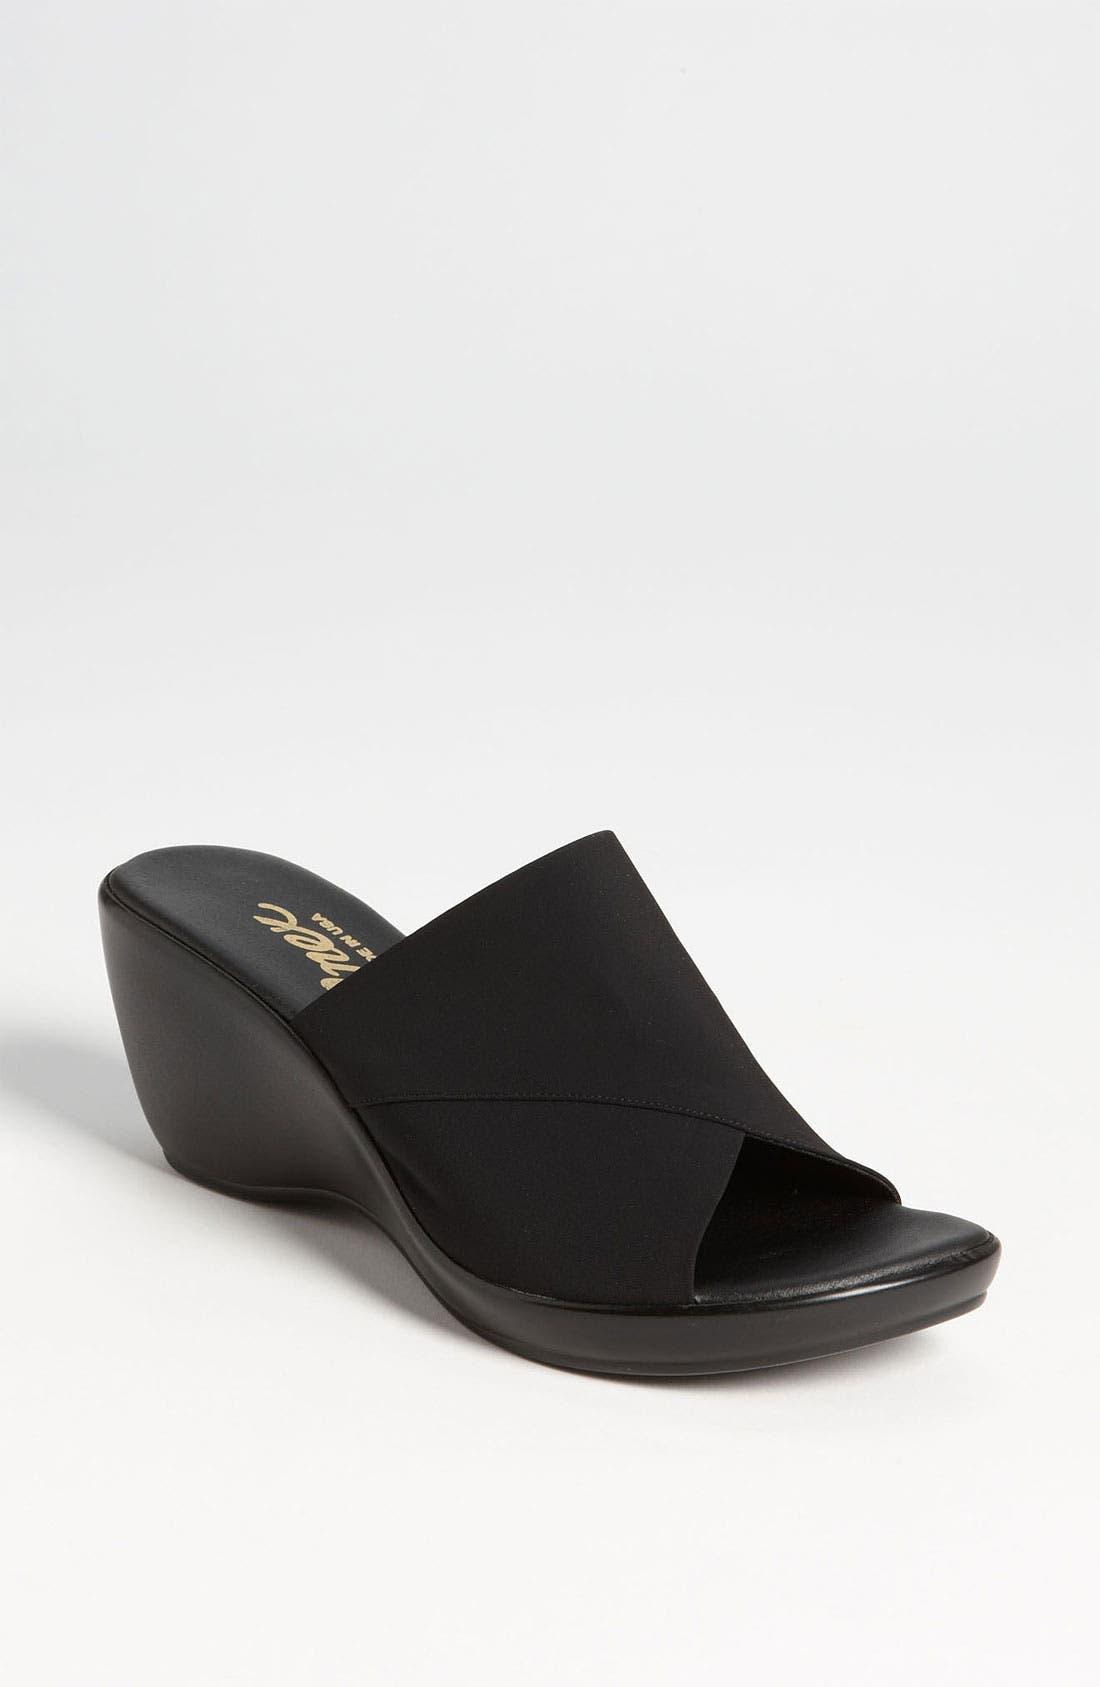 Alternate Image 1 Selected - Onex 'Deena' Wedge Sandal